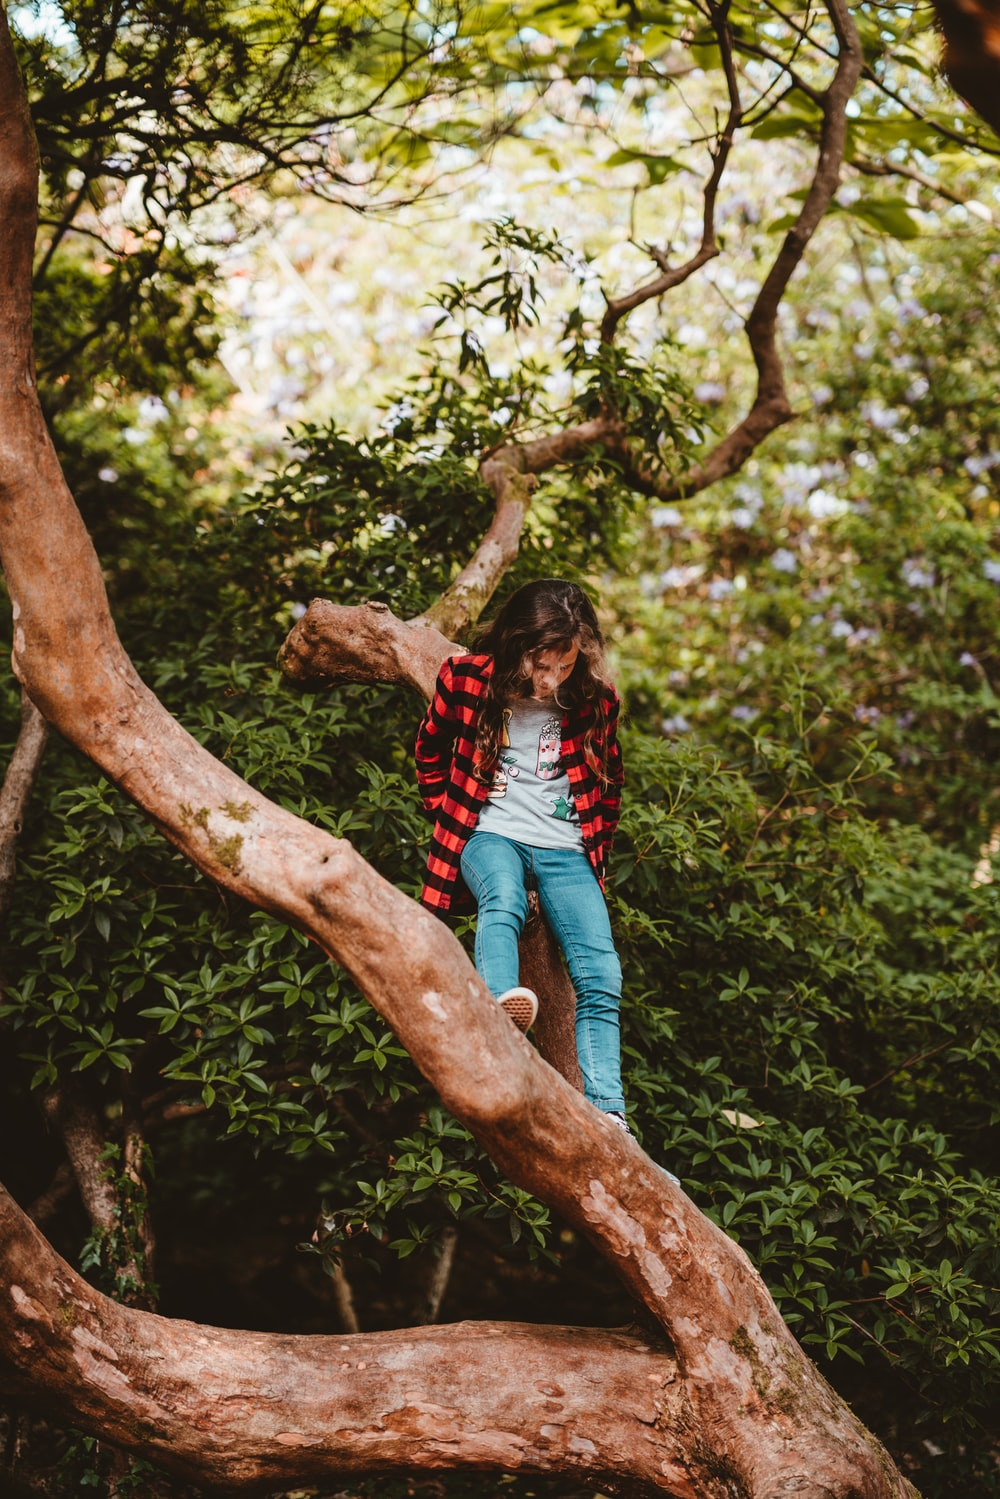 girl sitting on tree branch during daytime